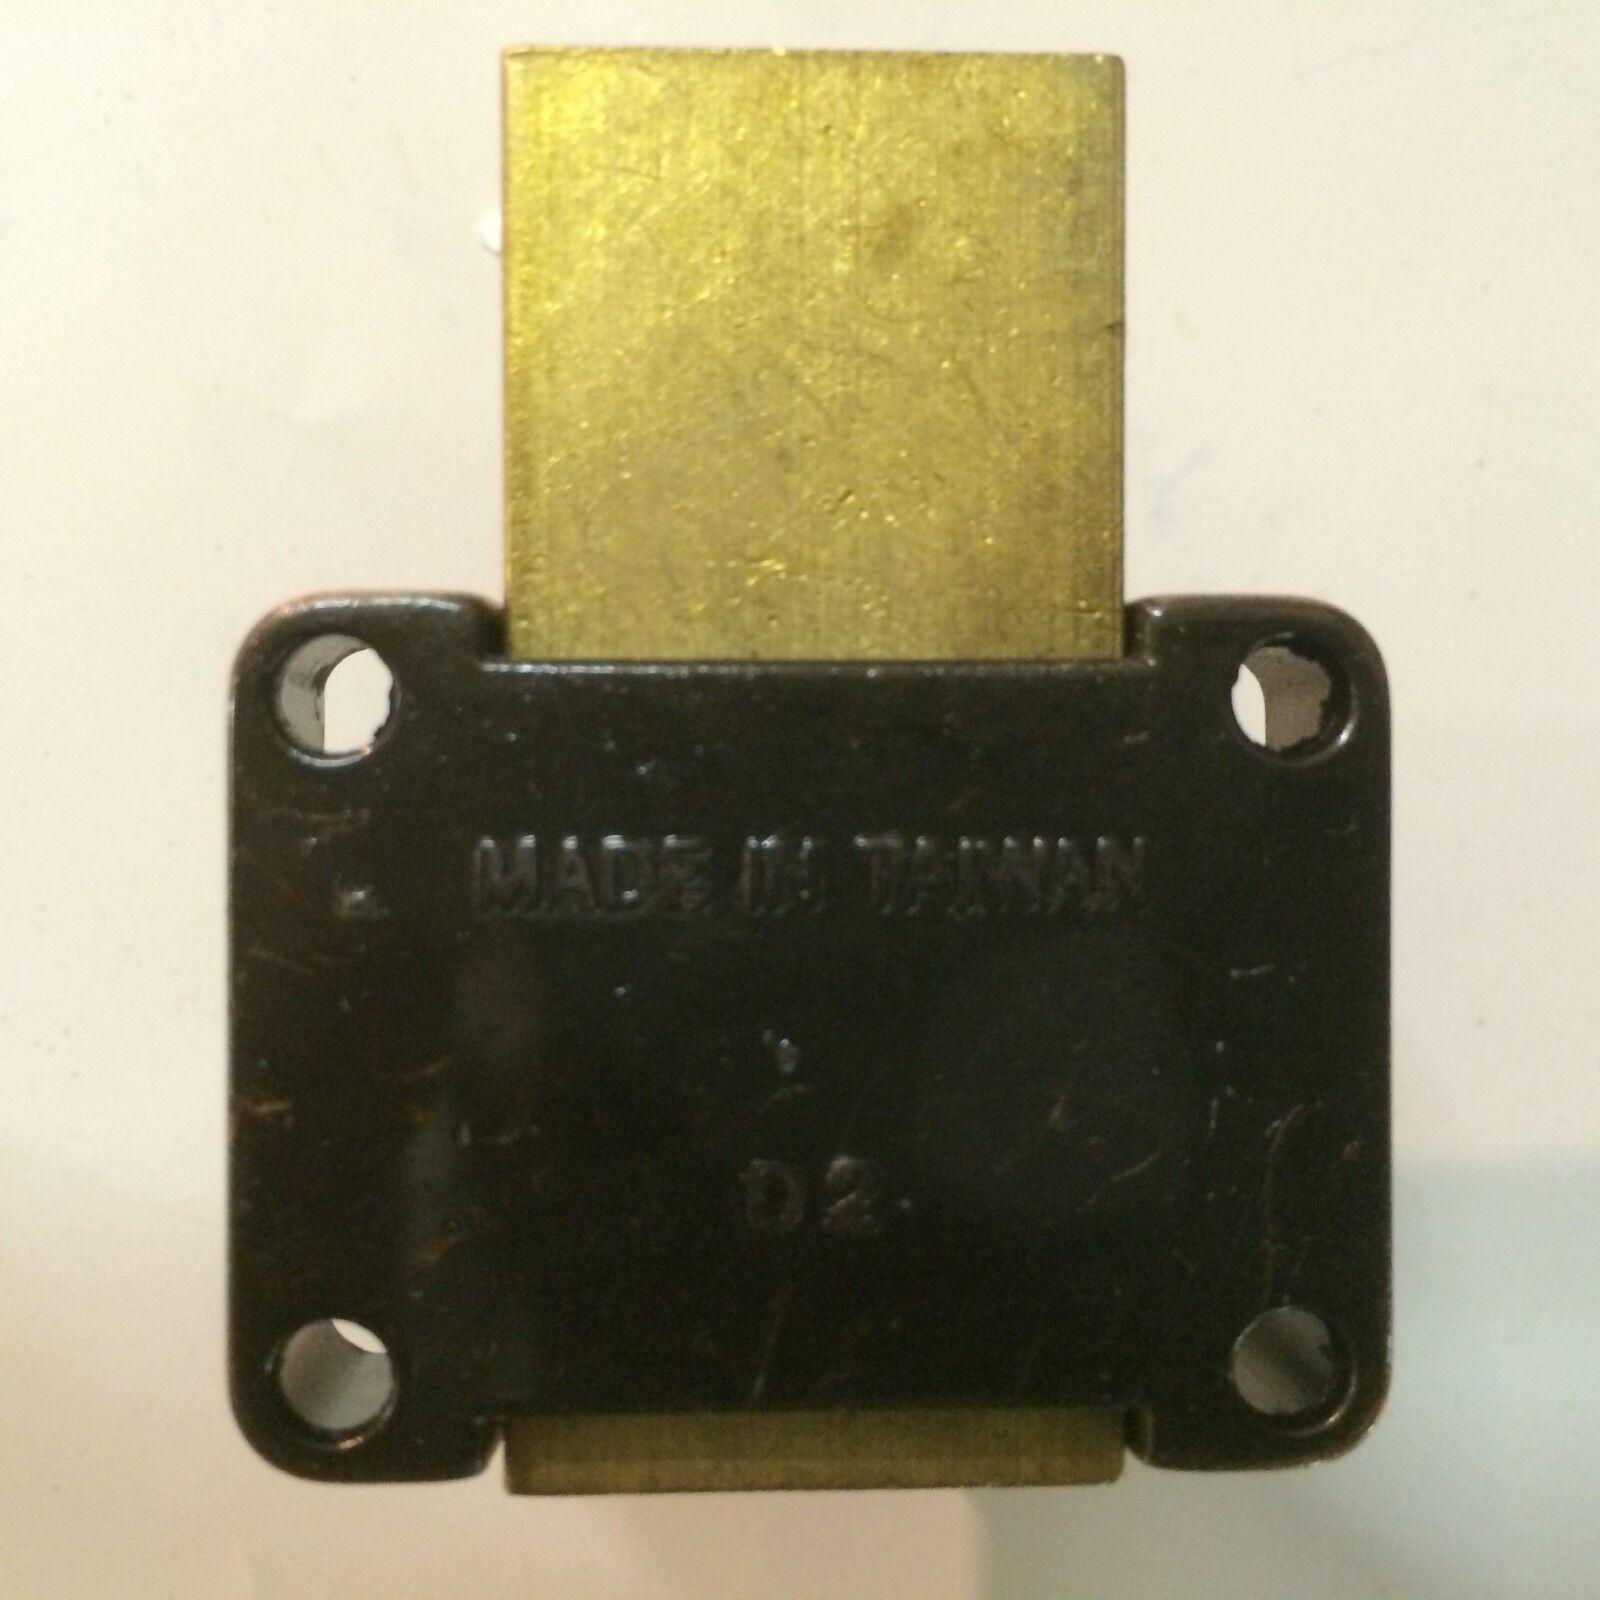 10 PC, KEY 010 NATIONAL CABINET OLYMPIC PIN TUMBLER DRAWER LOCK ...